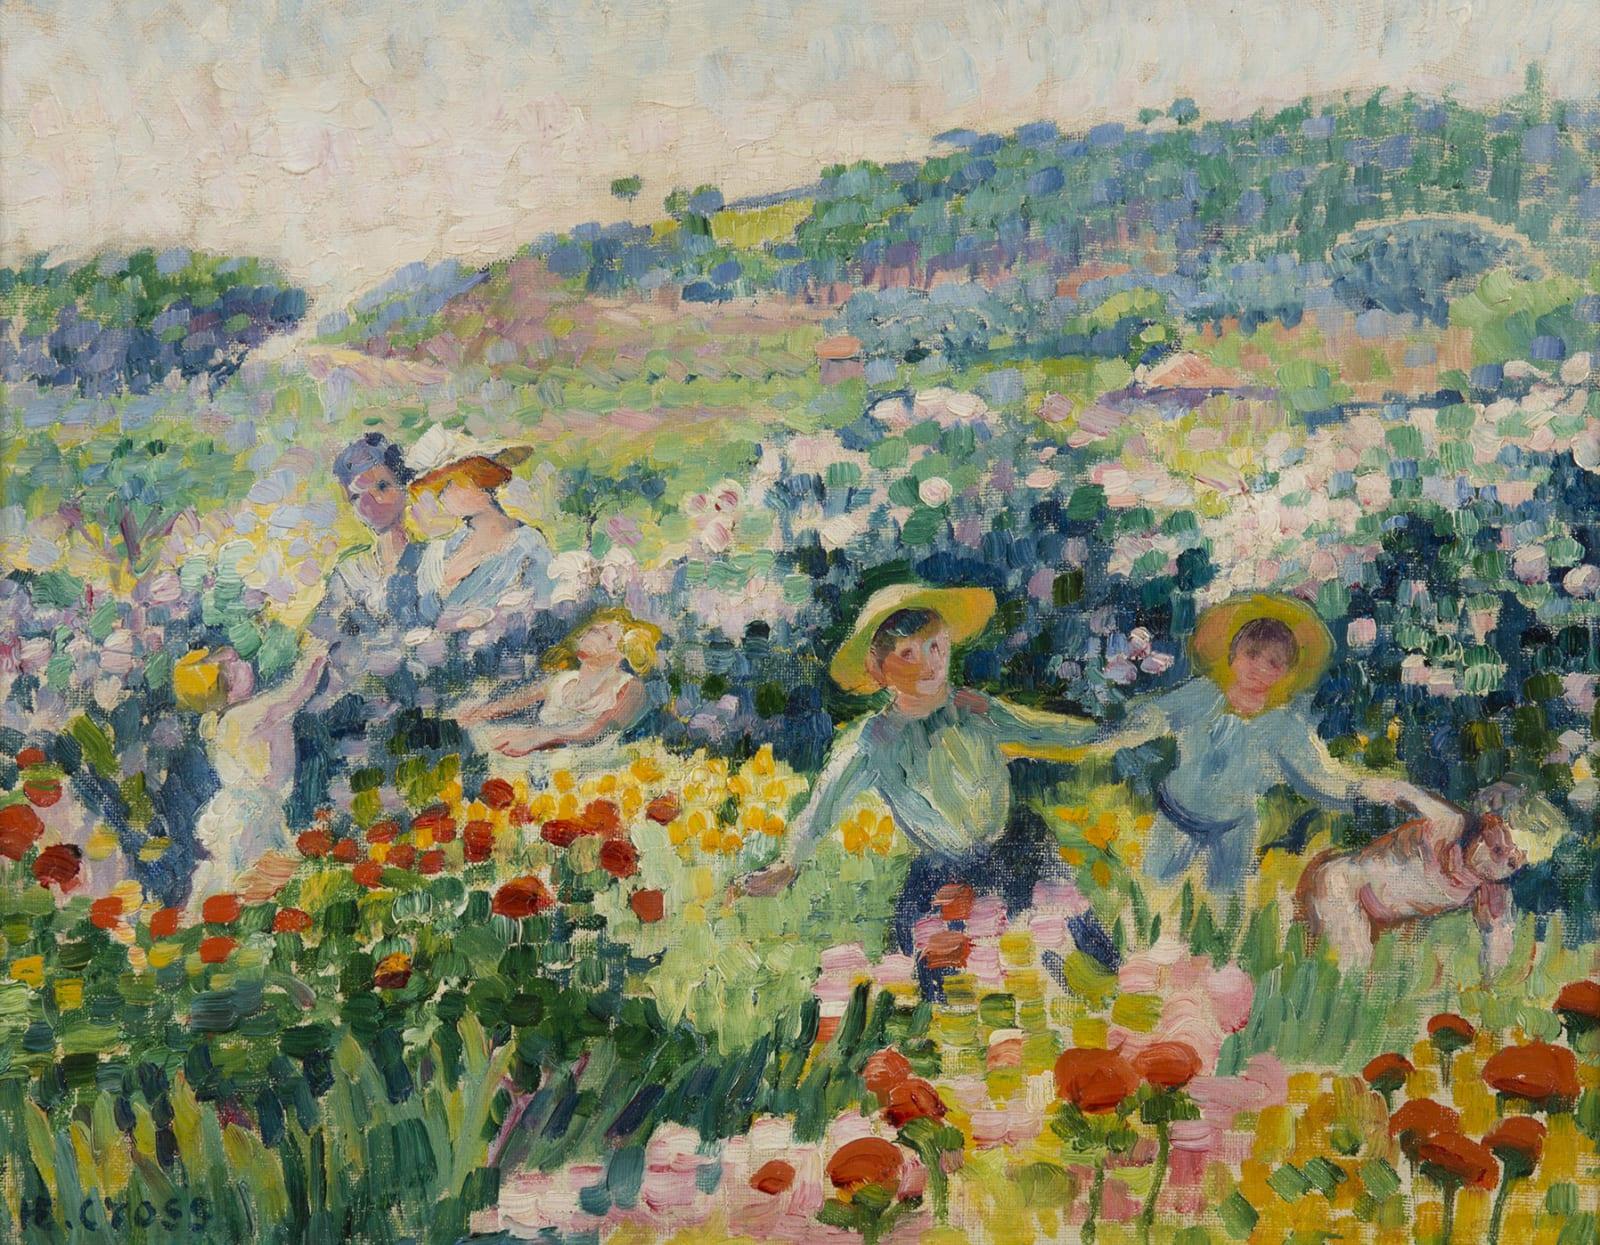 HENRI-EDMOND CROSS, La haie de roses, 1904